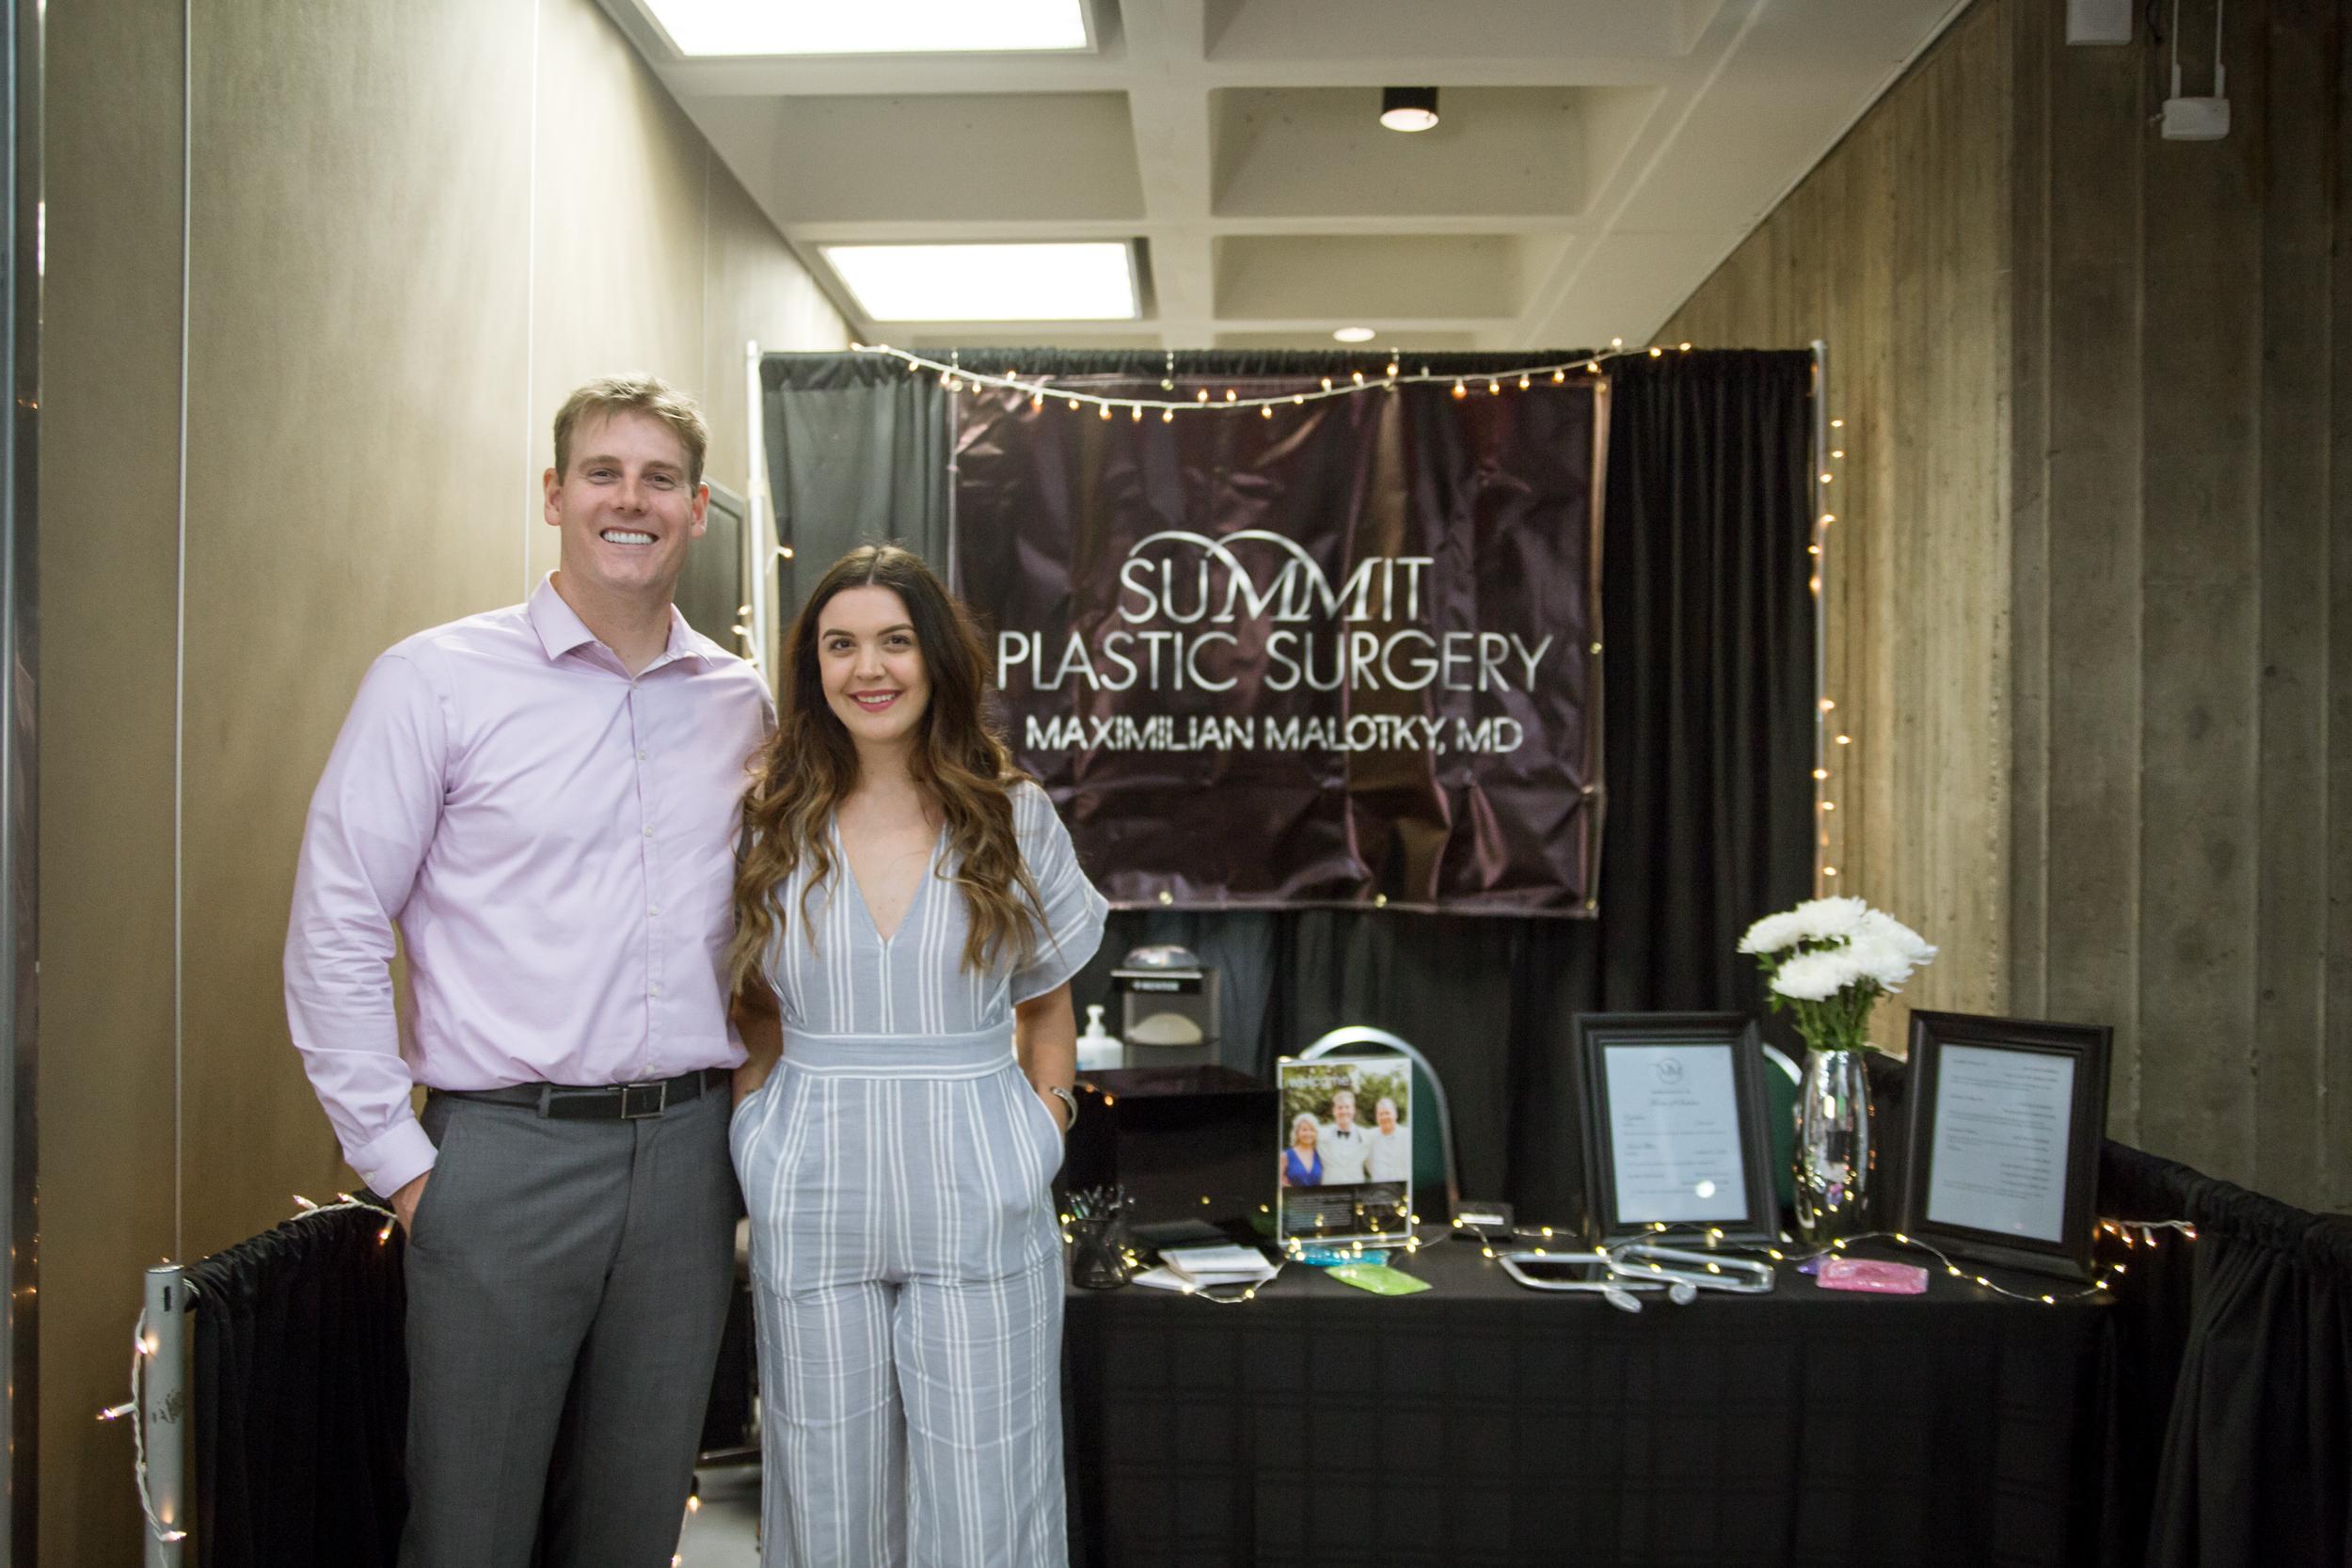 Summit Plastic Surgery Redding Bridal Show Wedding Expo